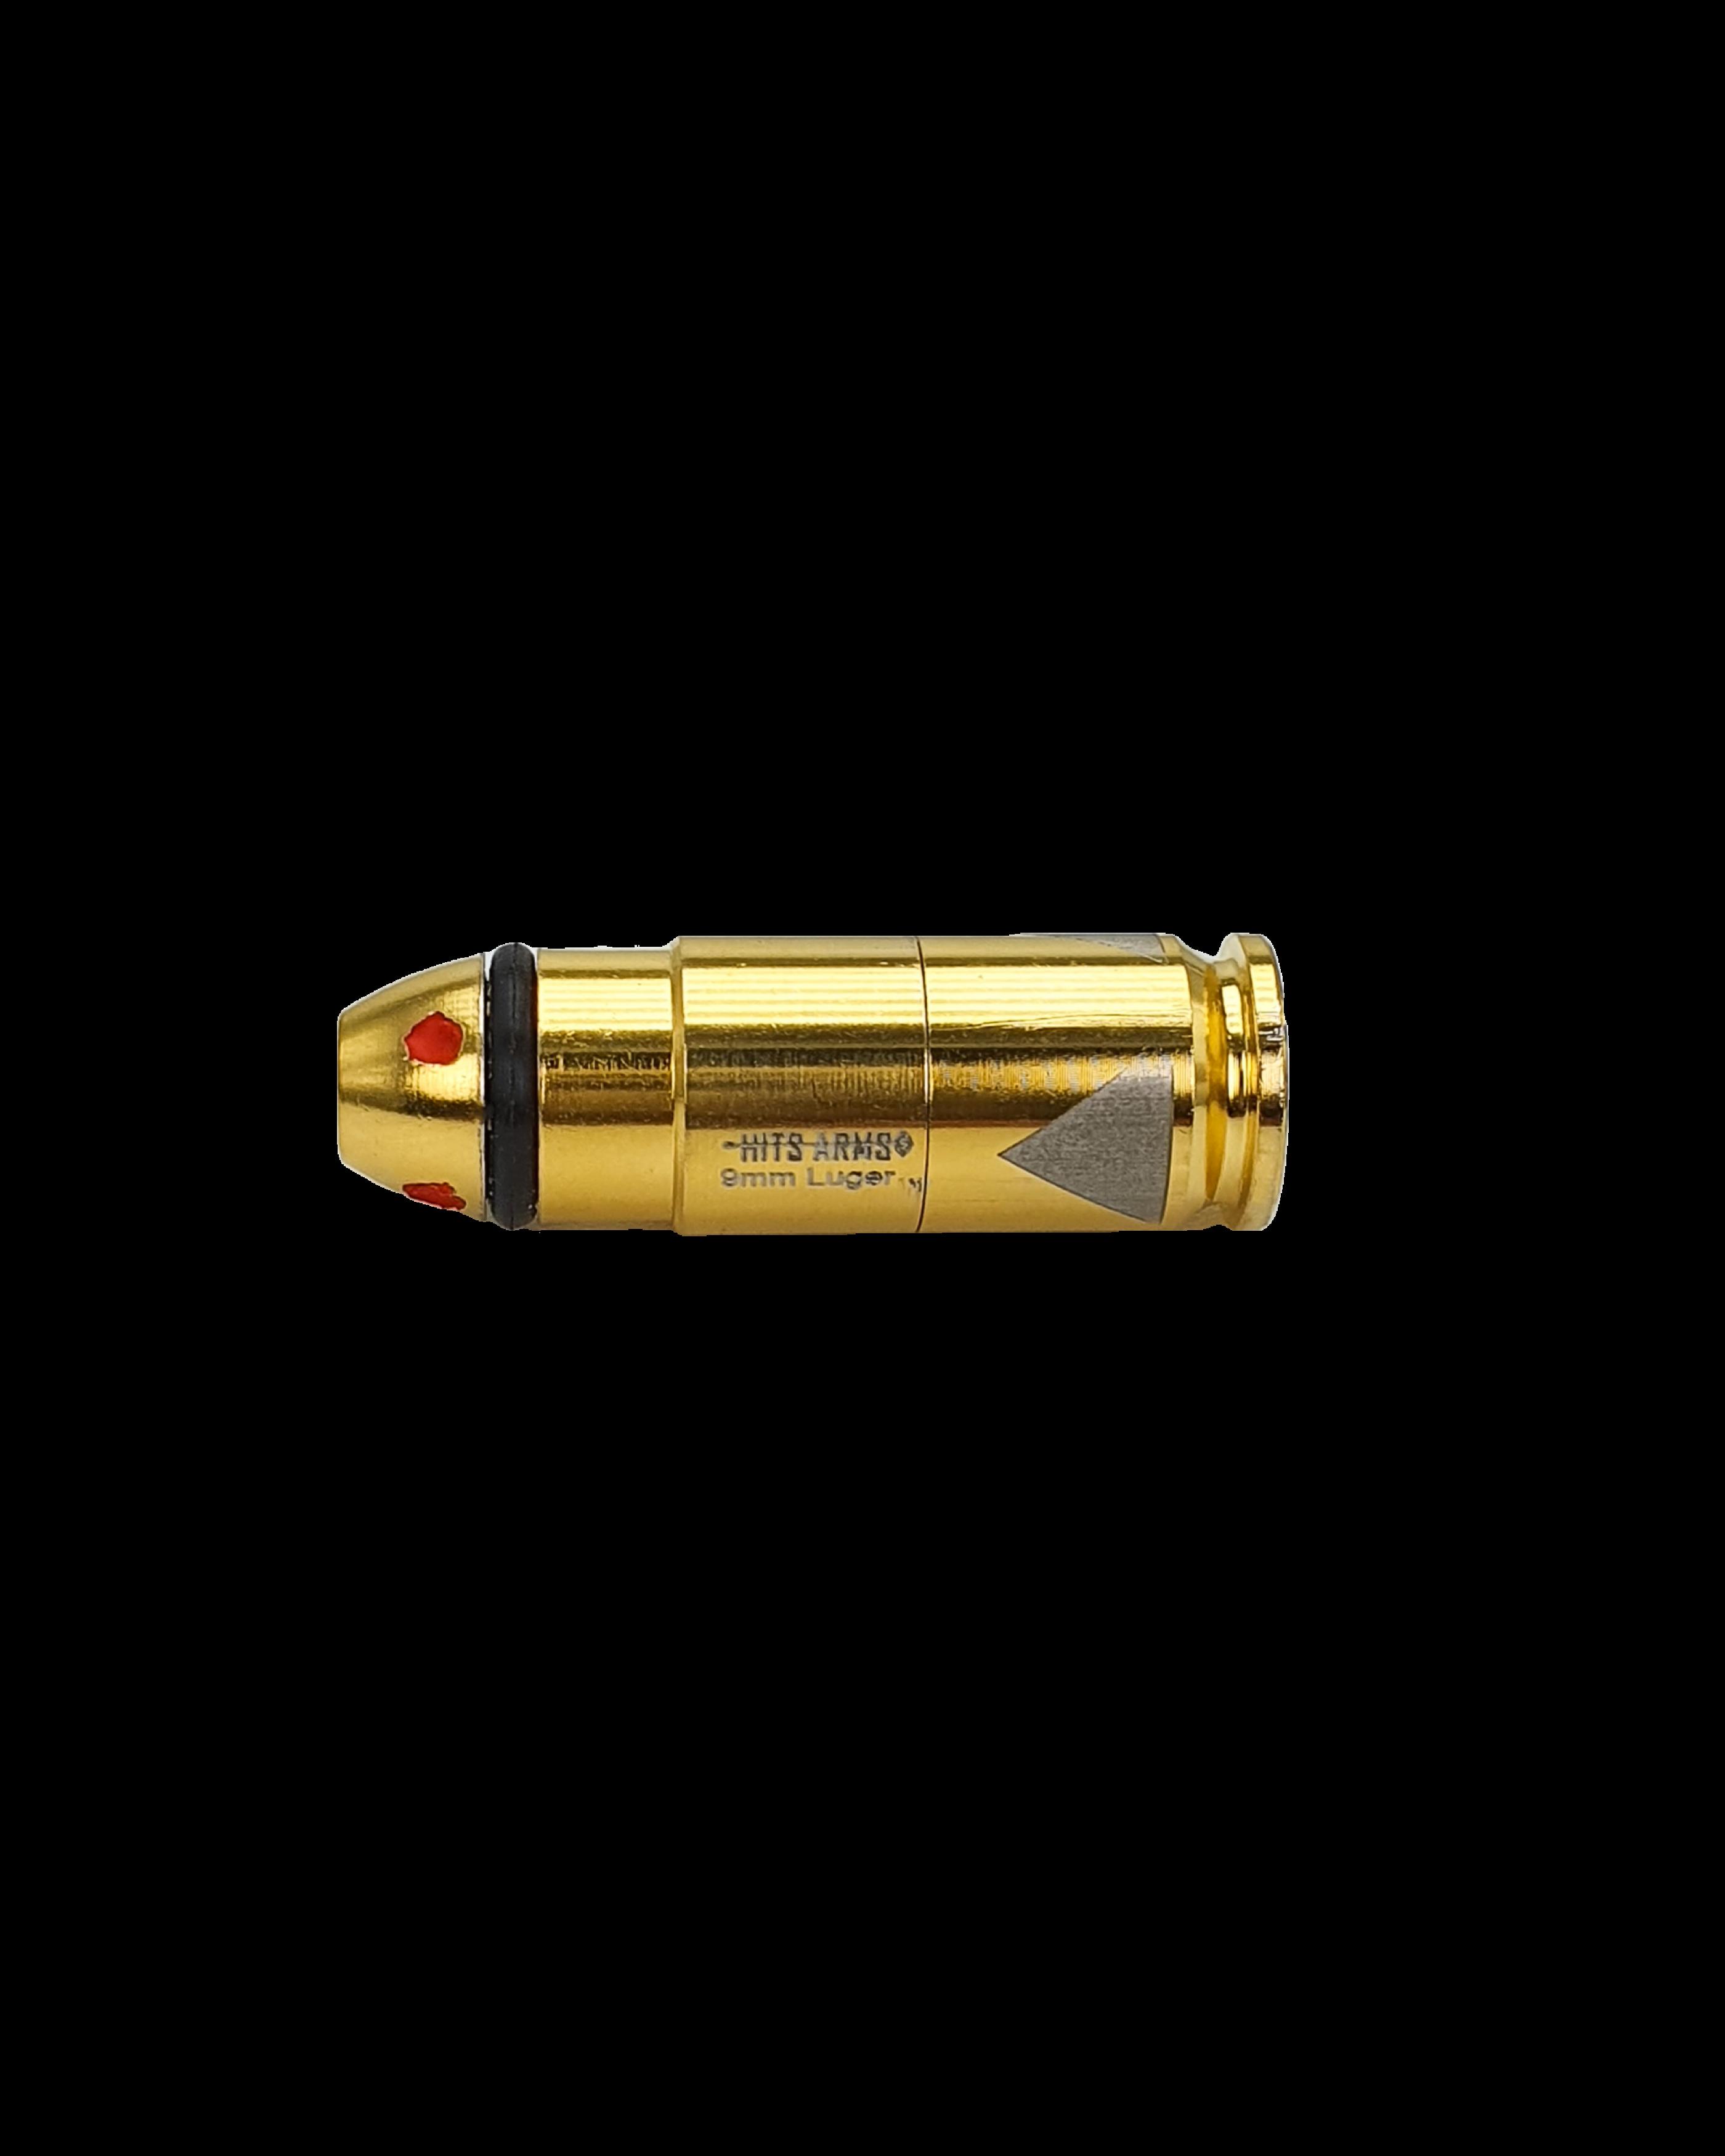 hits arms gen. 2 laser bullet dry fire